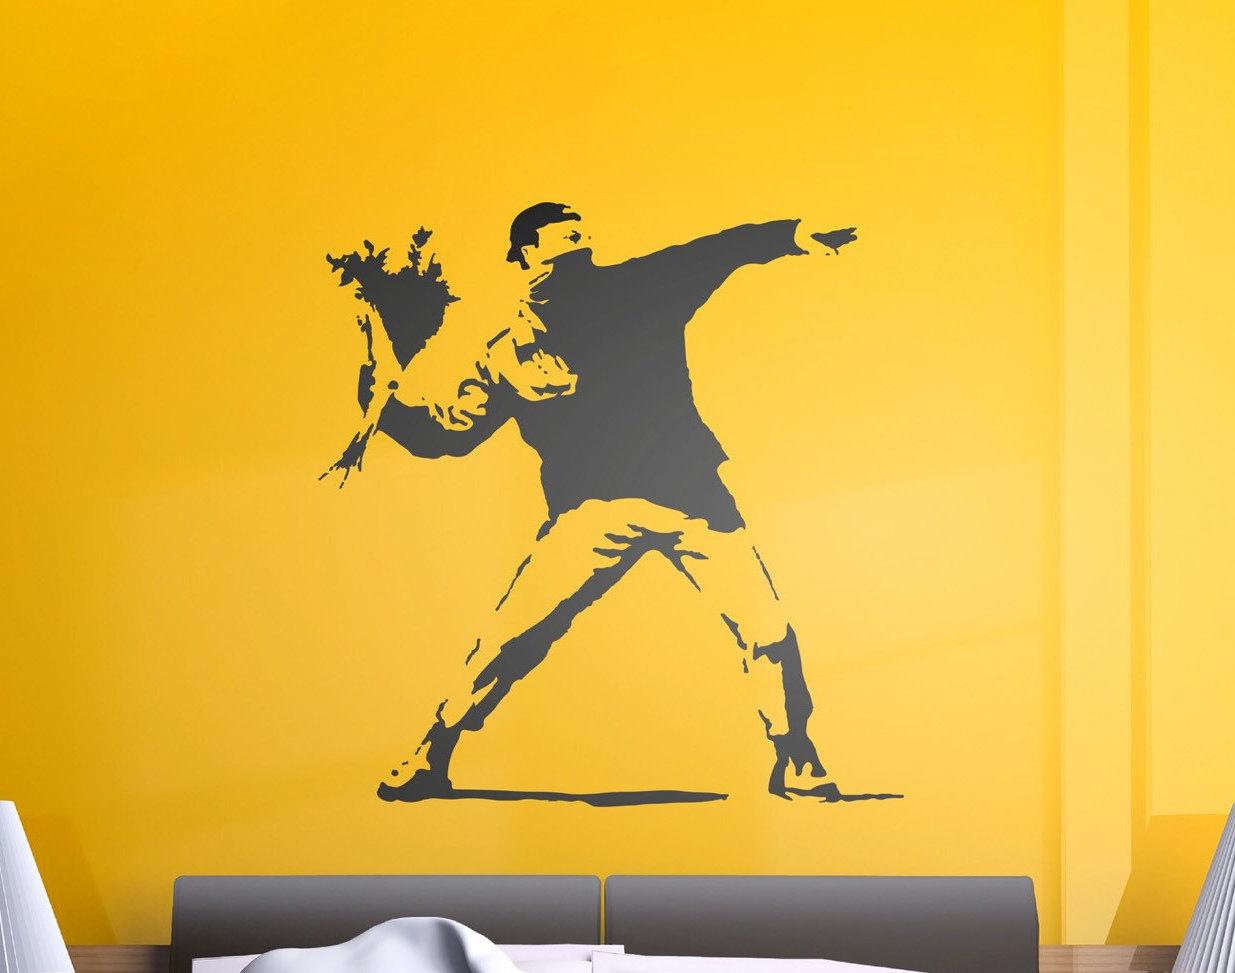 Banksy Man Throwing Flowers Wall Sticker | Popular Banksy Wall Stickers